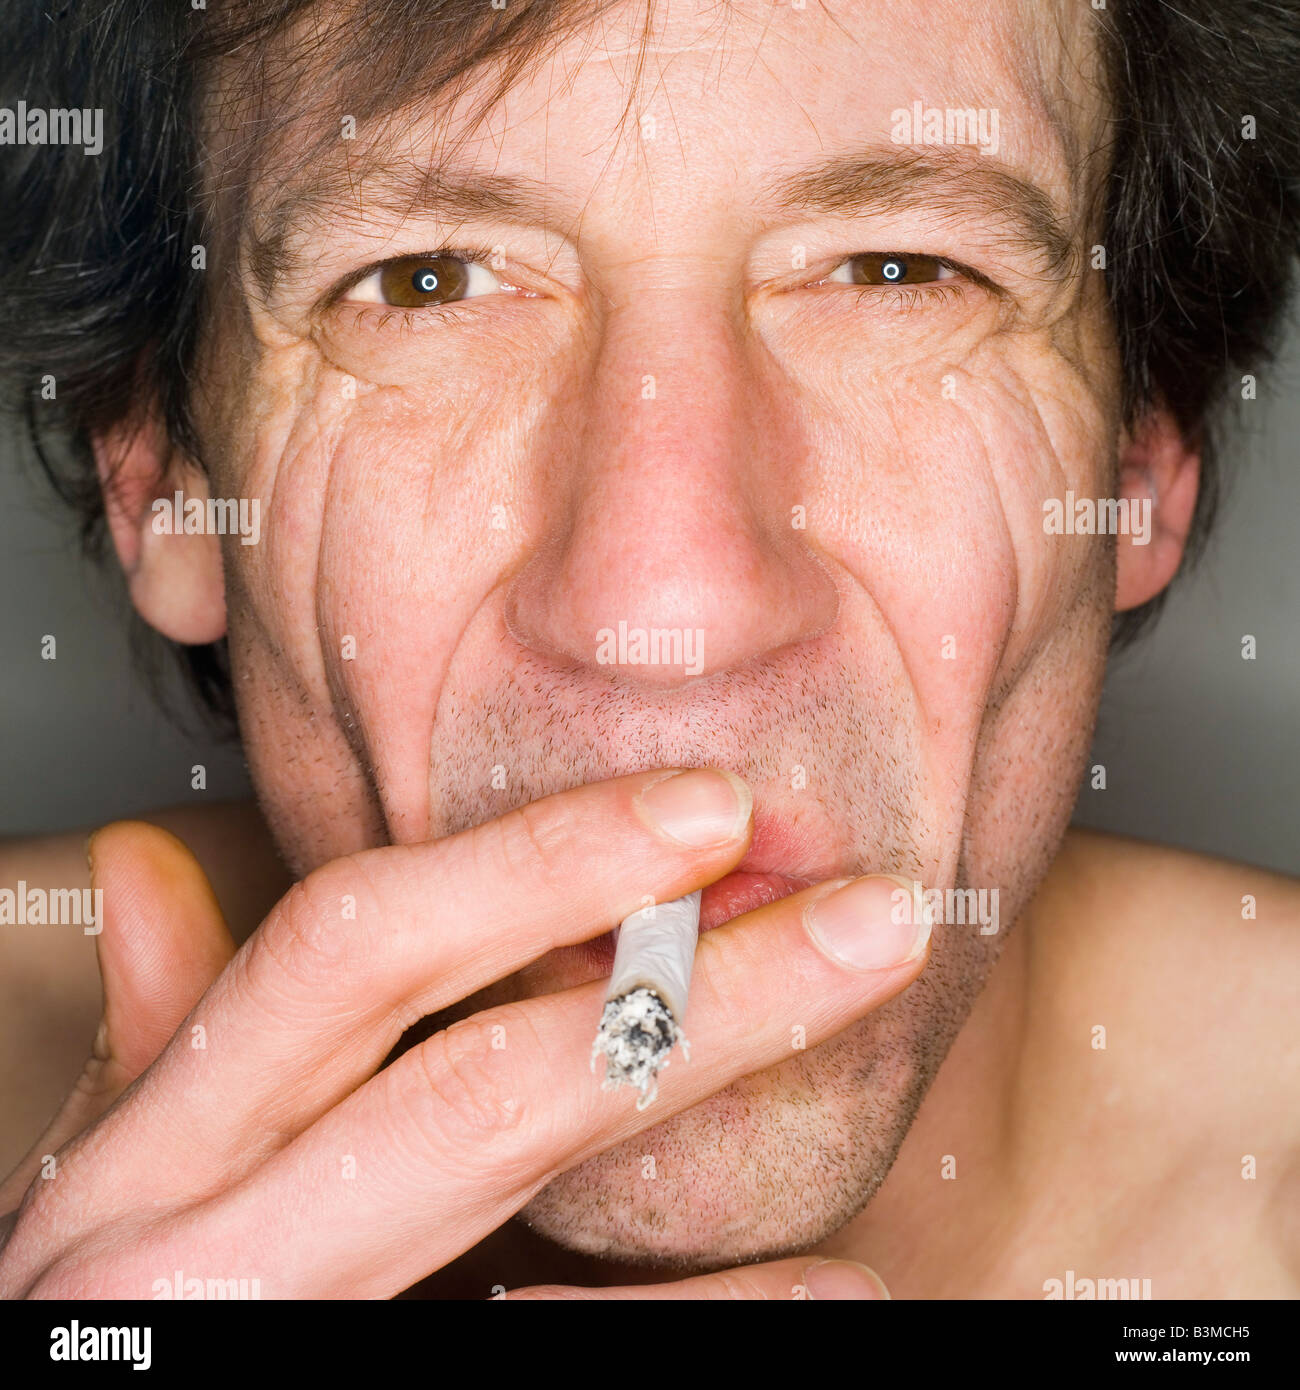 Mann Rauchen, Nahaufnahme, Porträt Stockfoto